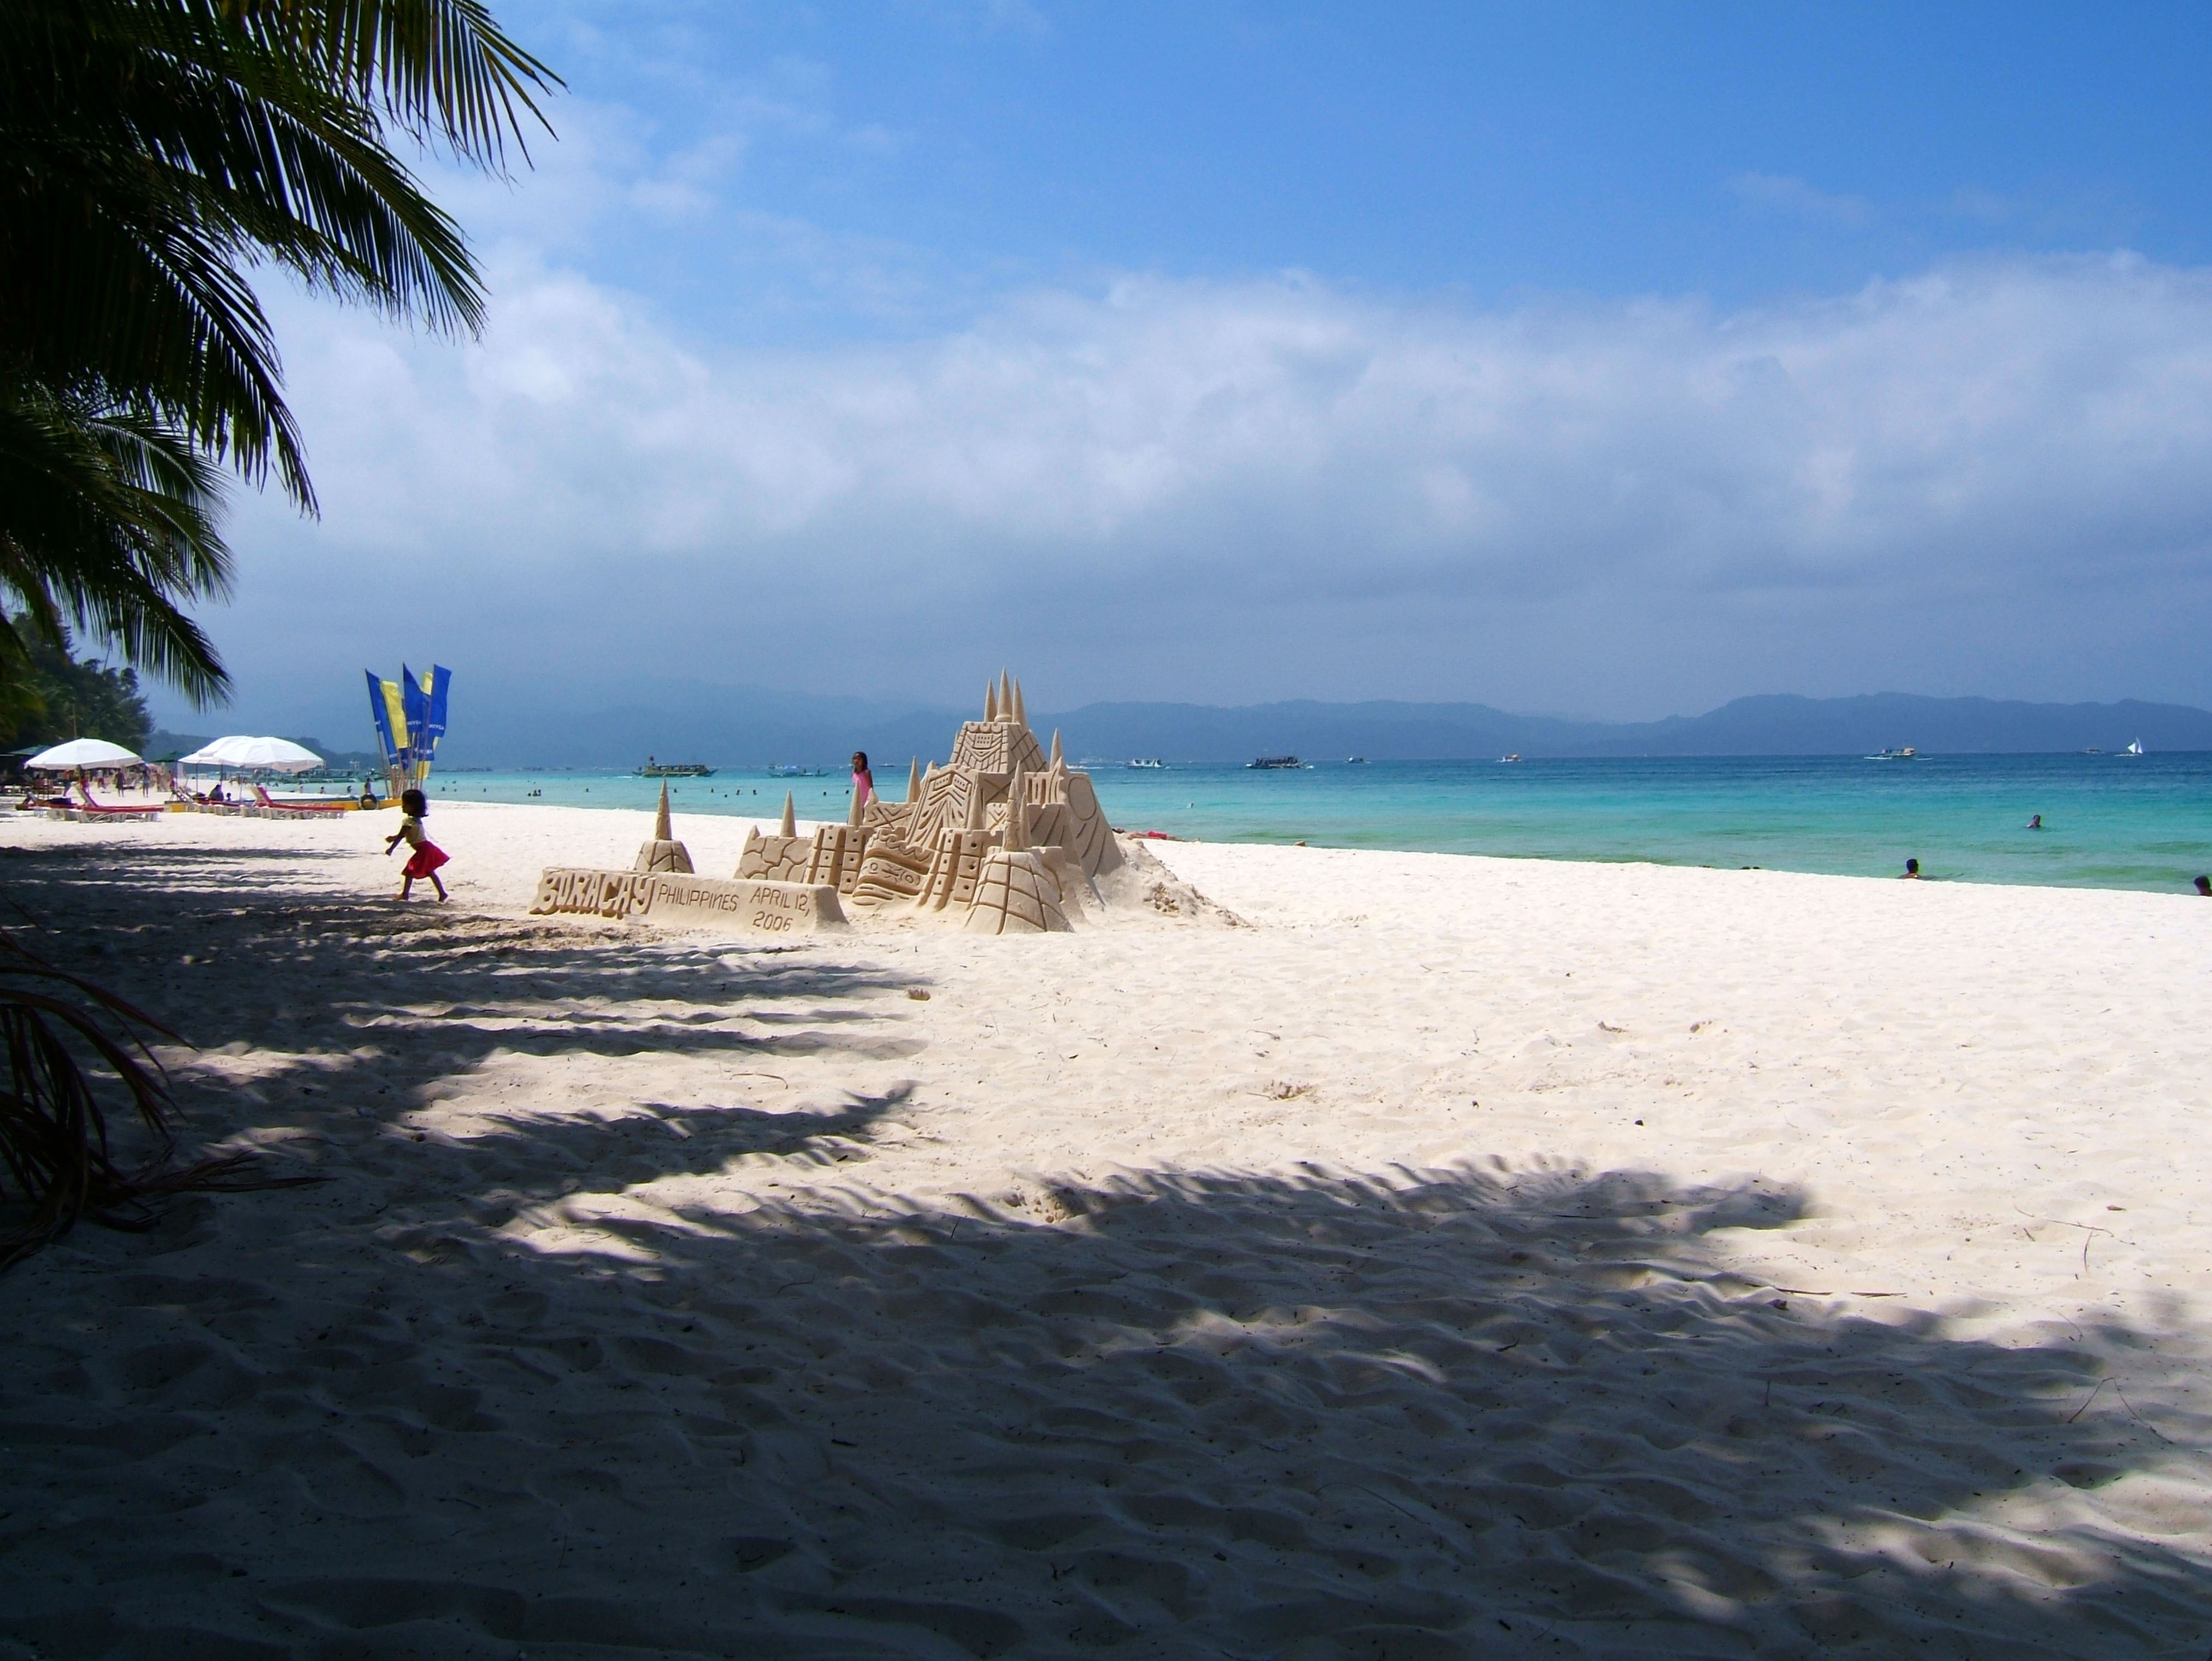 Philippines Sugar Islands Caticlan Boracay White Beach Sand Castles 2006 01